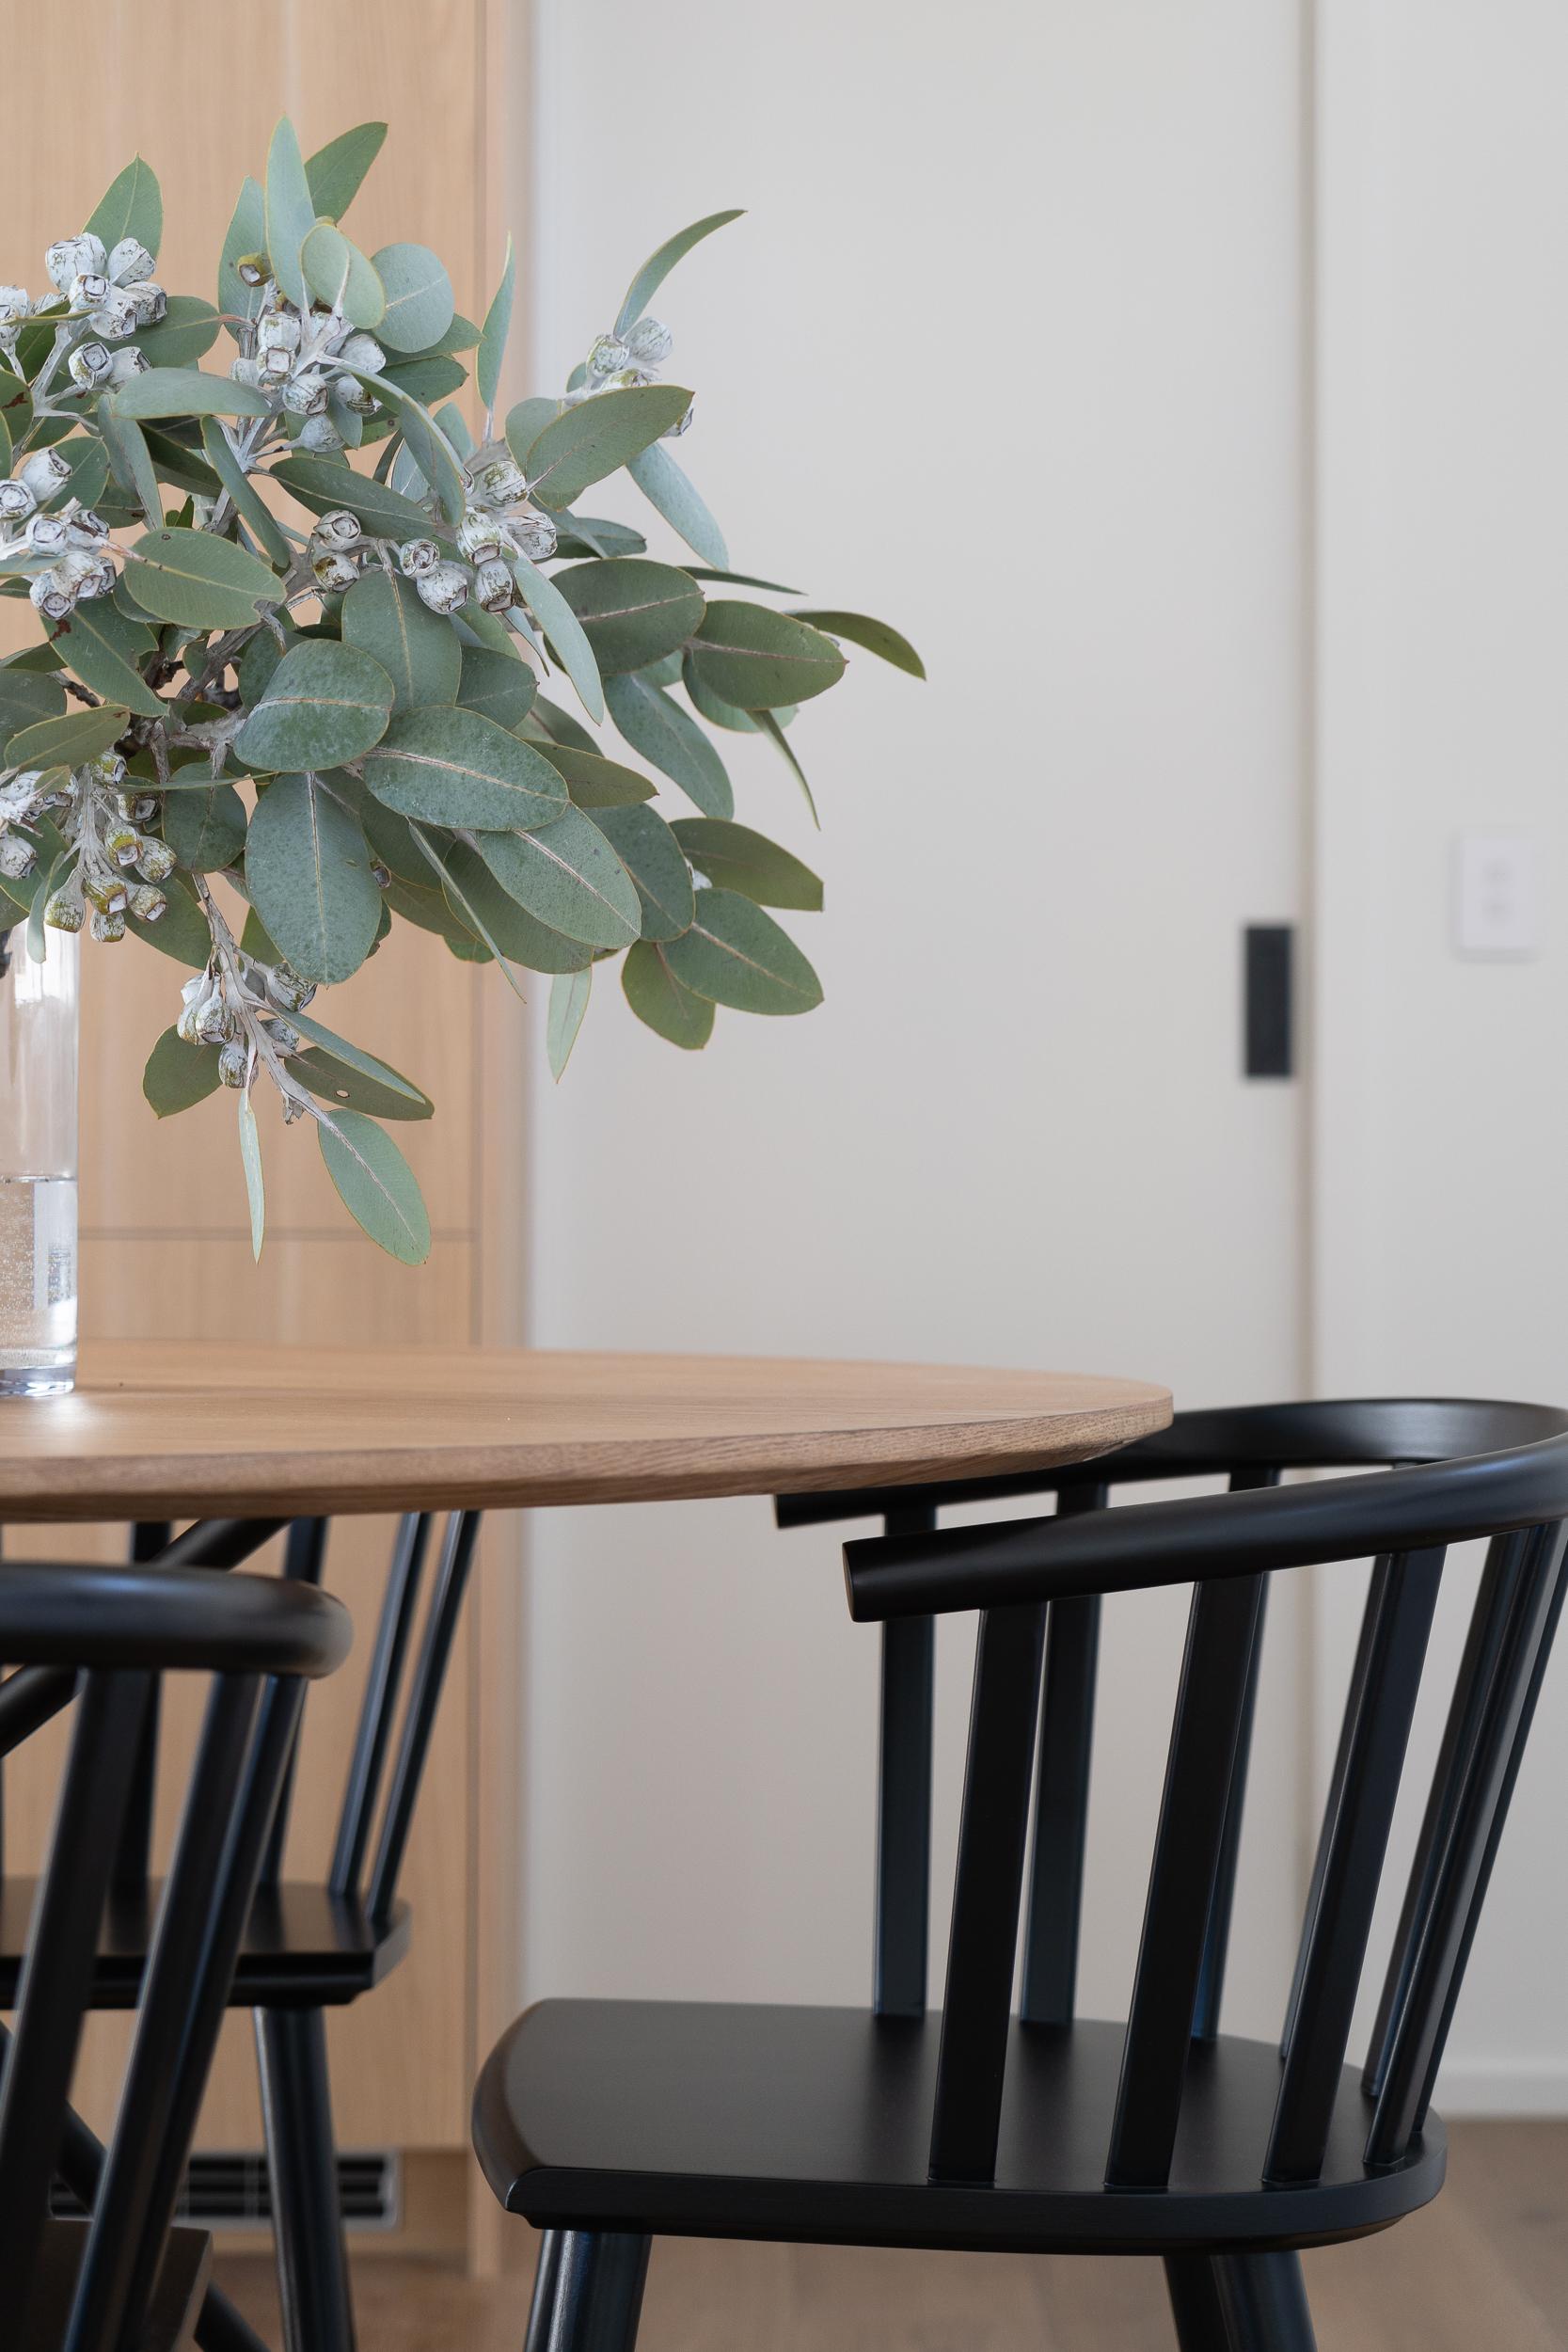 Buckley Dining Seddon Townhouse Property Styling 1 (2).jpg